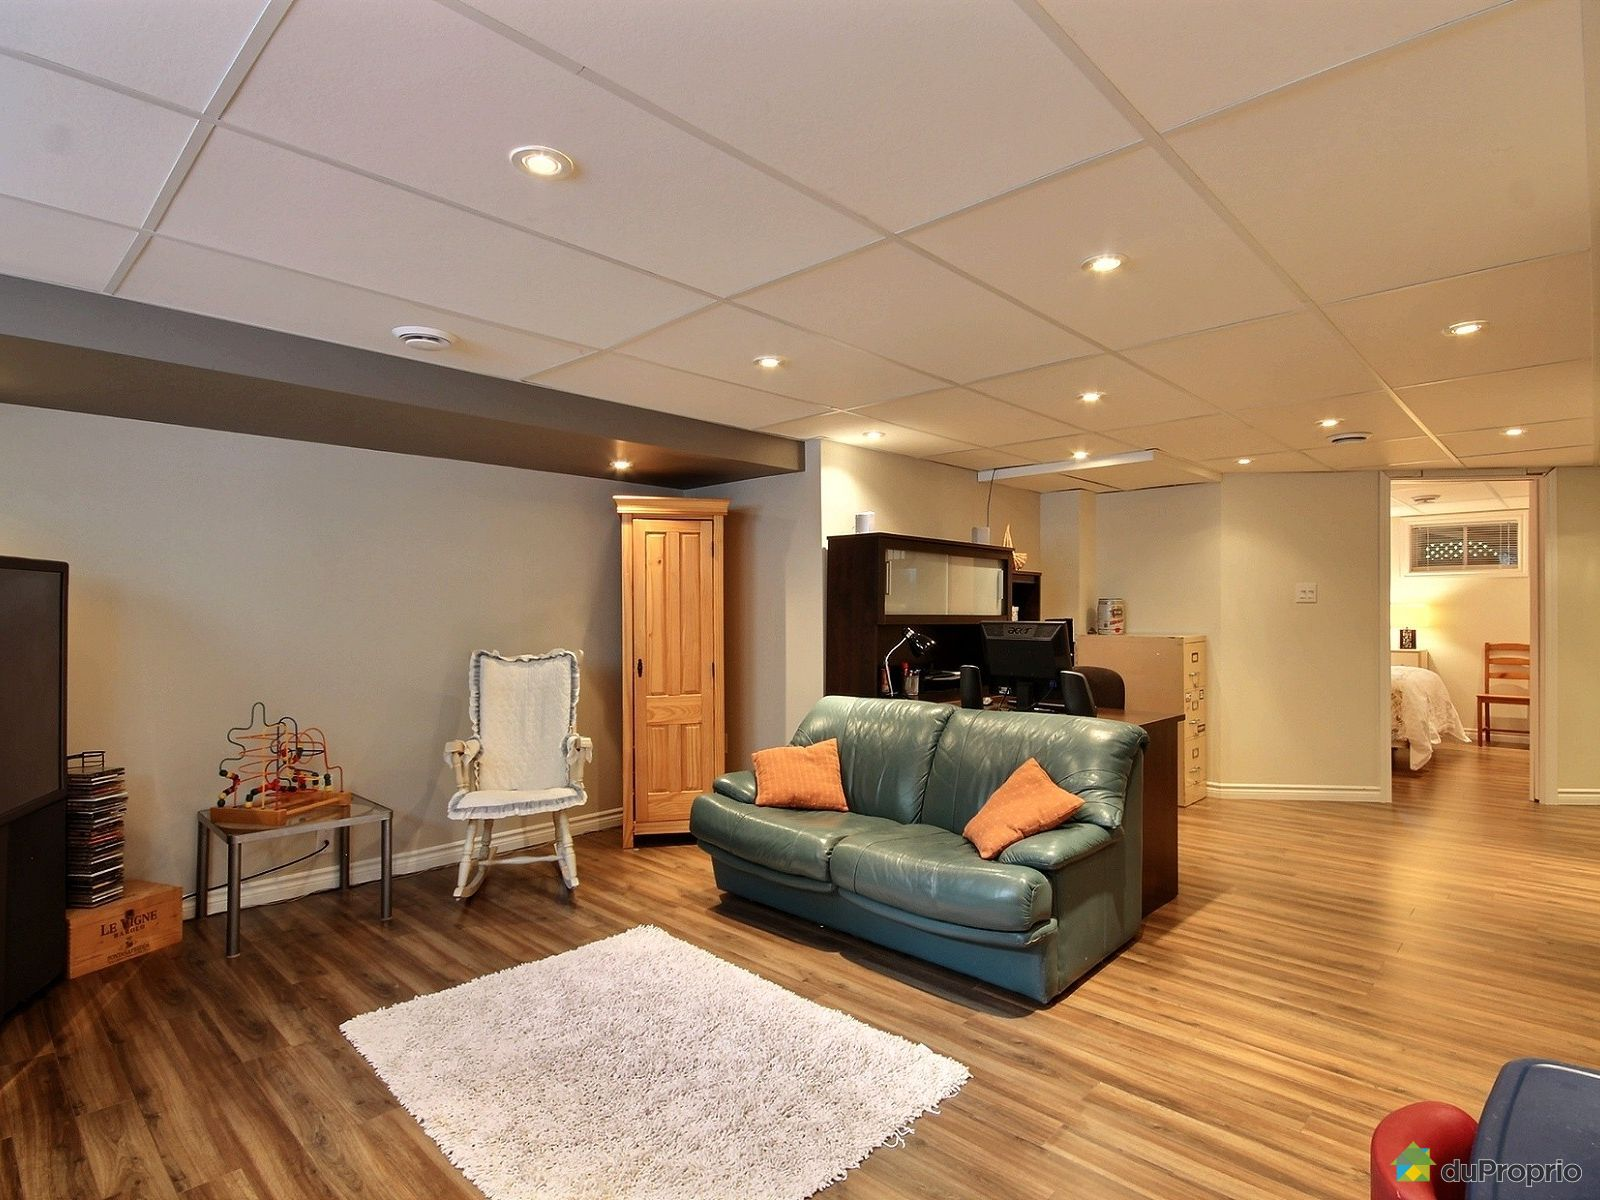 House For Sale In Beloeil 431 Rue Le Corbusier Duproprio 685825